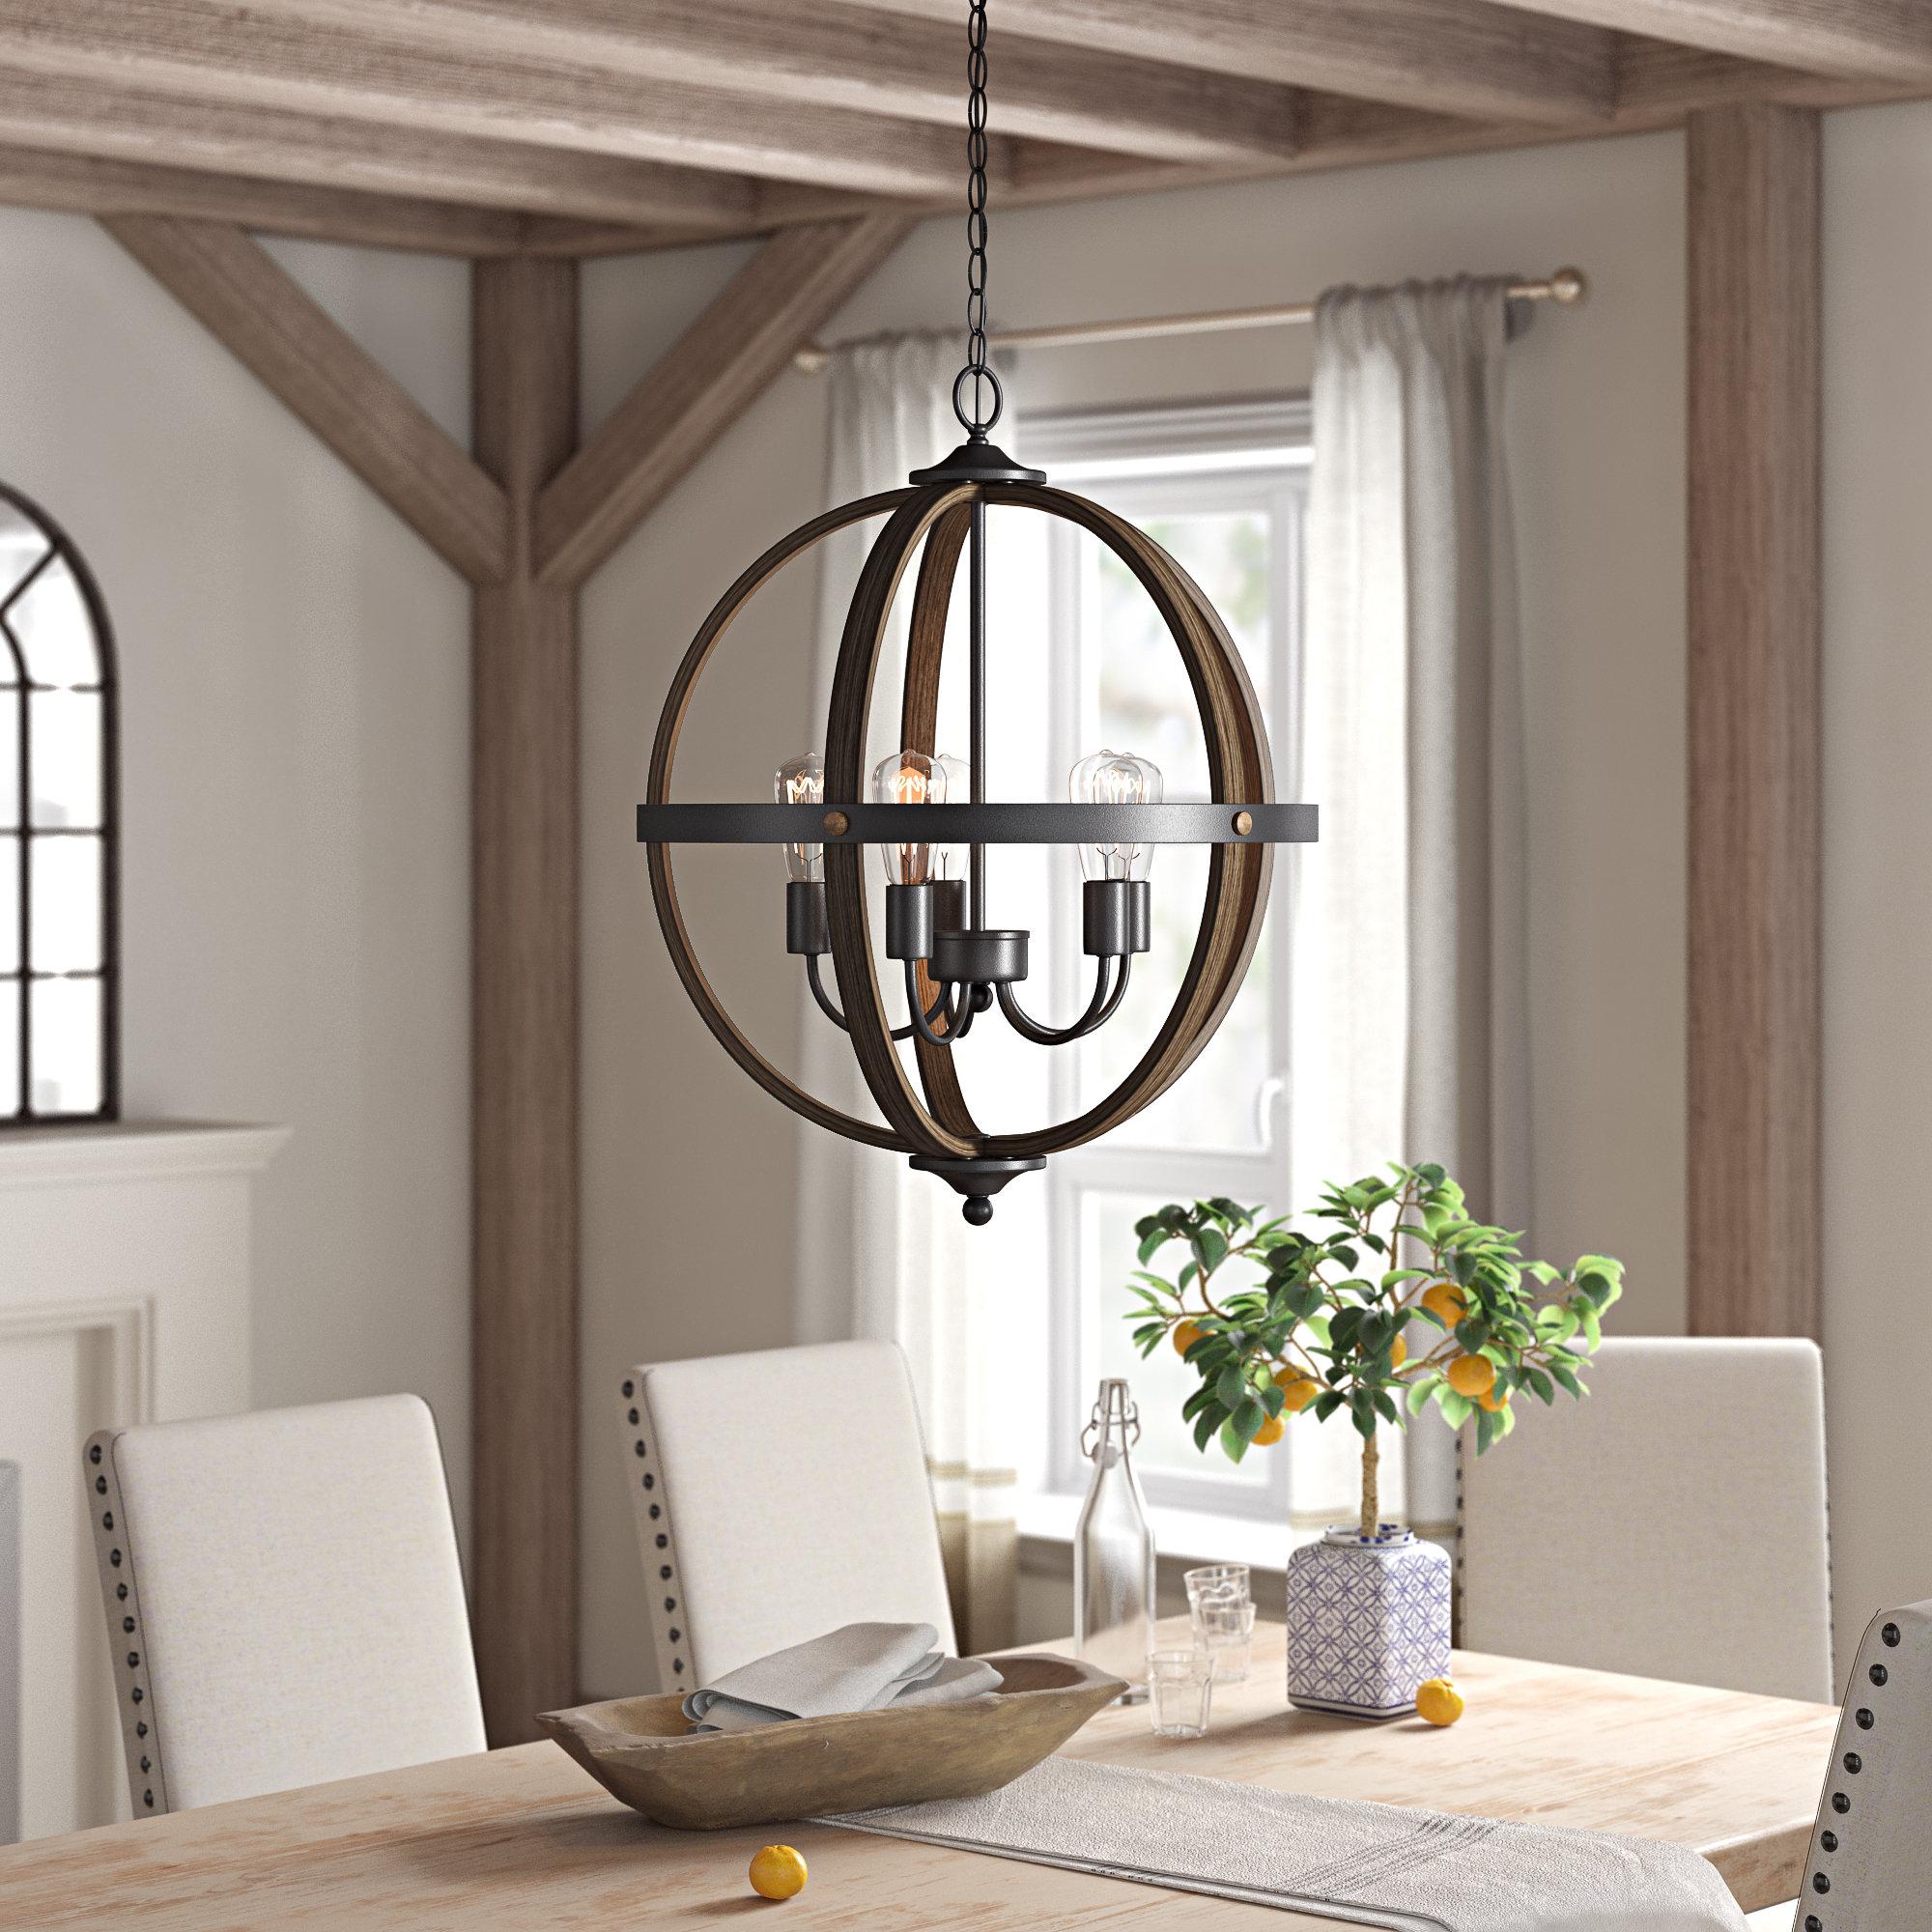 2020 Filipe Globe Chandeliers pertaining to Makeba 5-Light Globe Chandelier